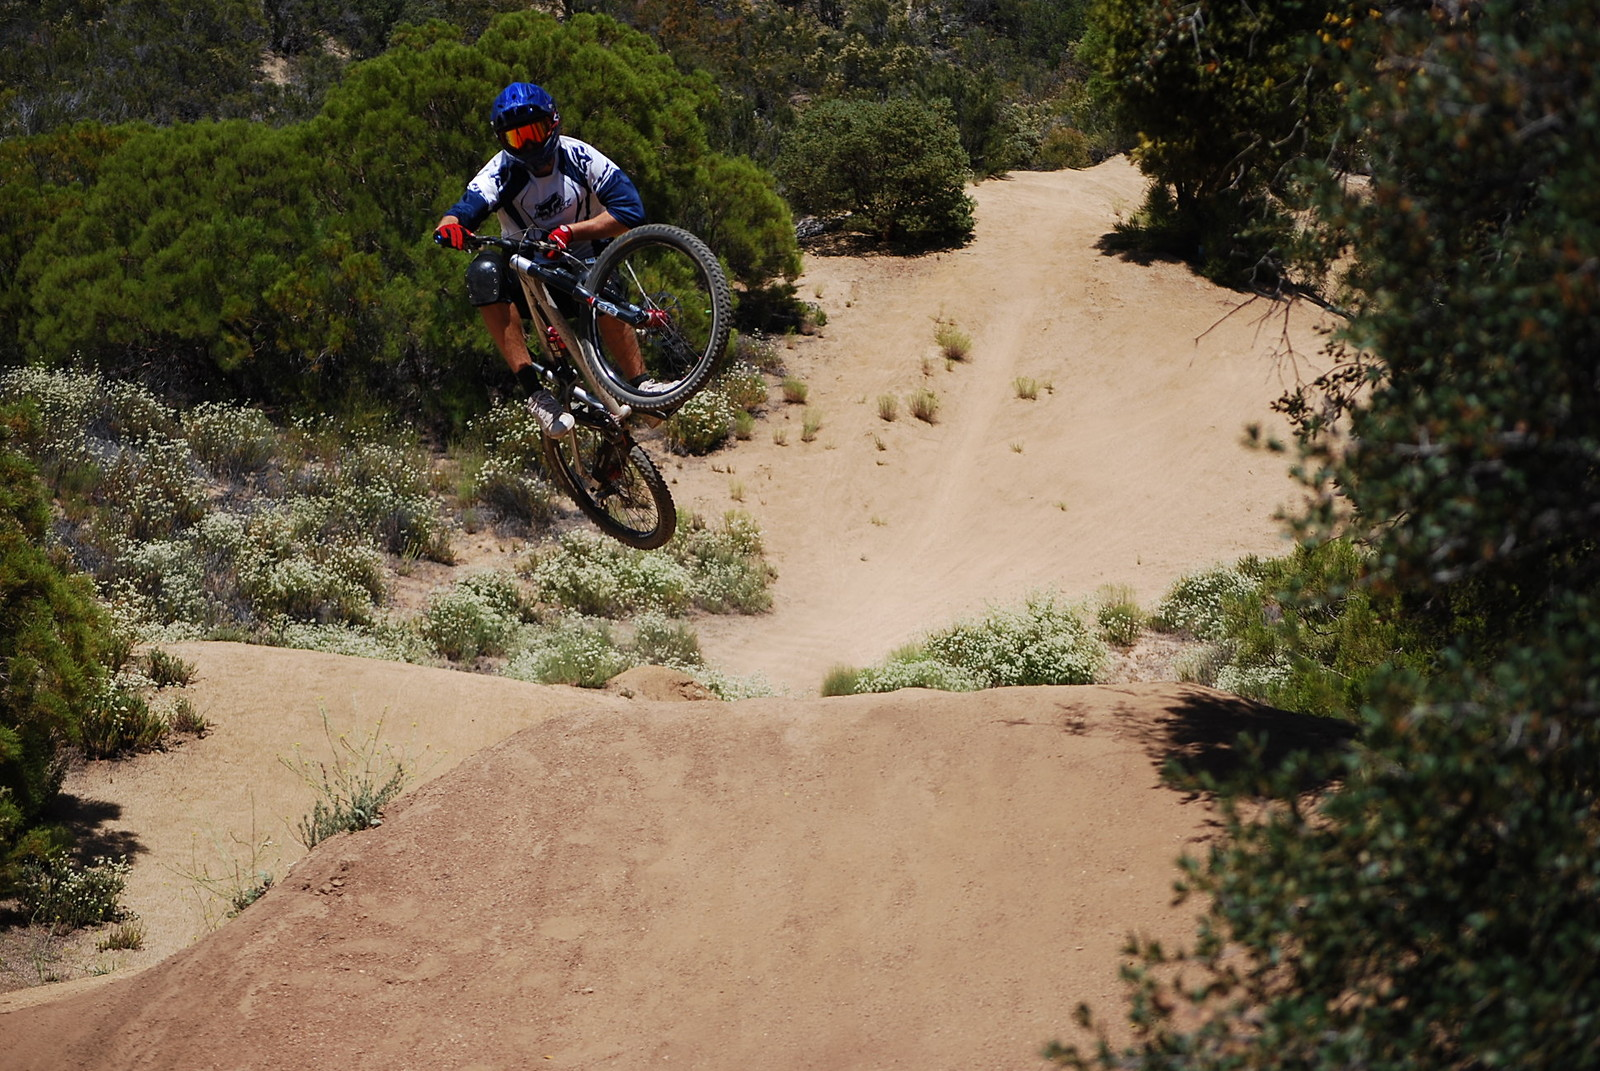 Hip at Pine Valley - adamdigby - Mountain Biking Pictures - Vital MTB